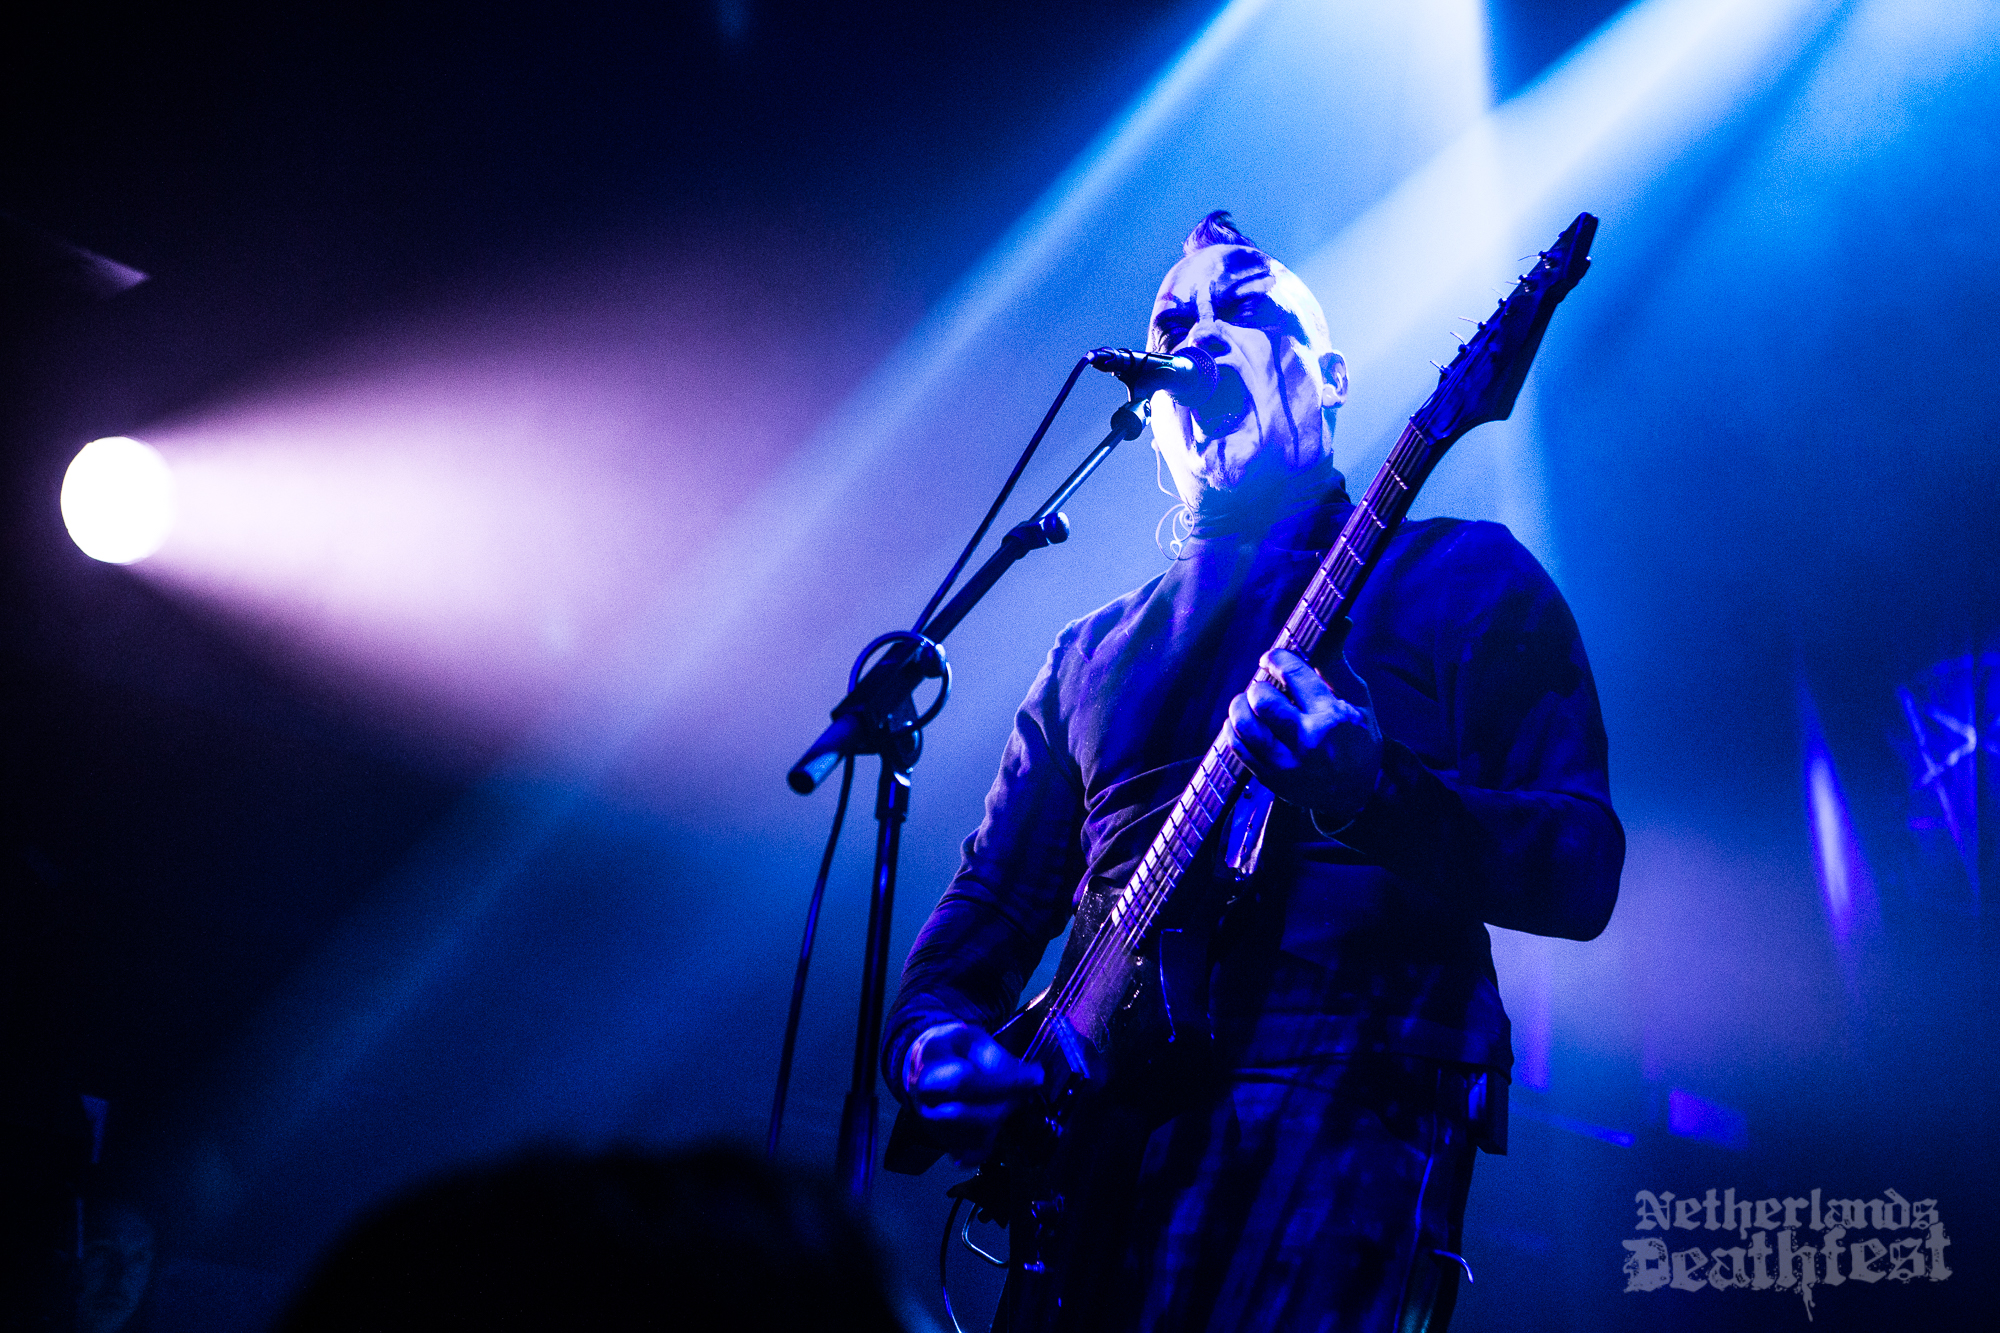 Darkspace - Copyright : Niels Vinck